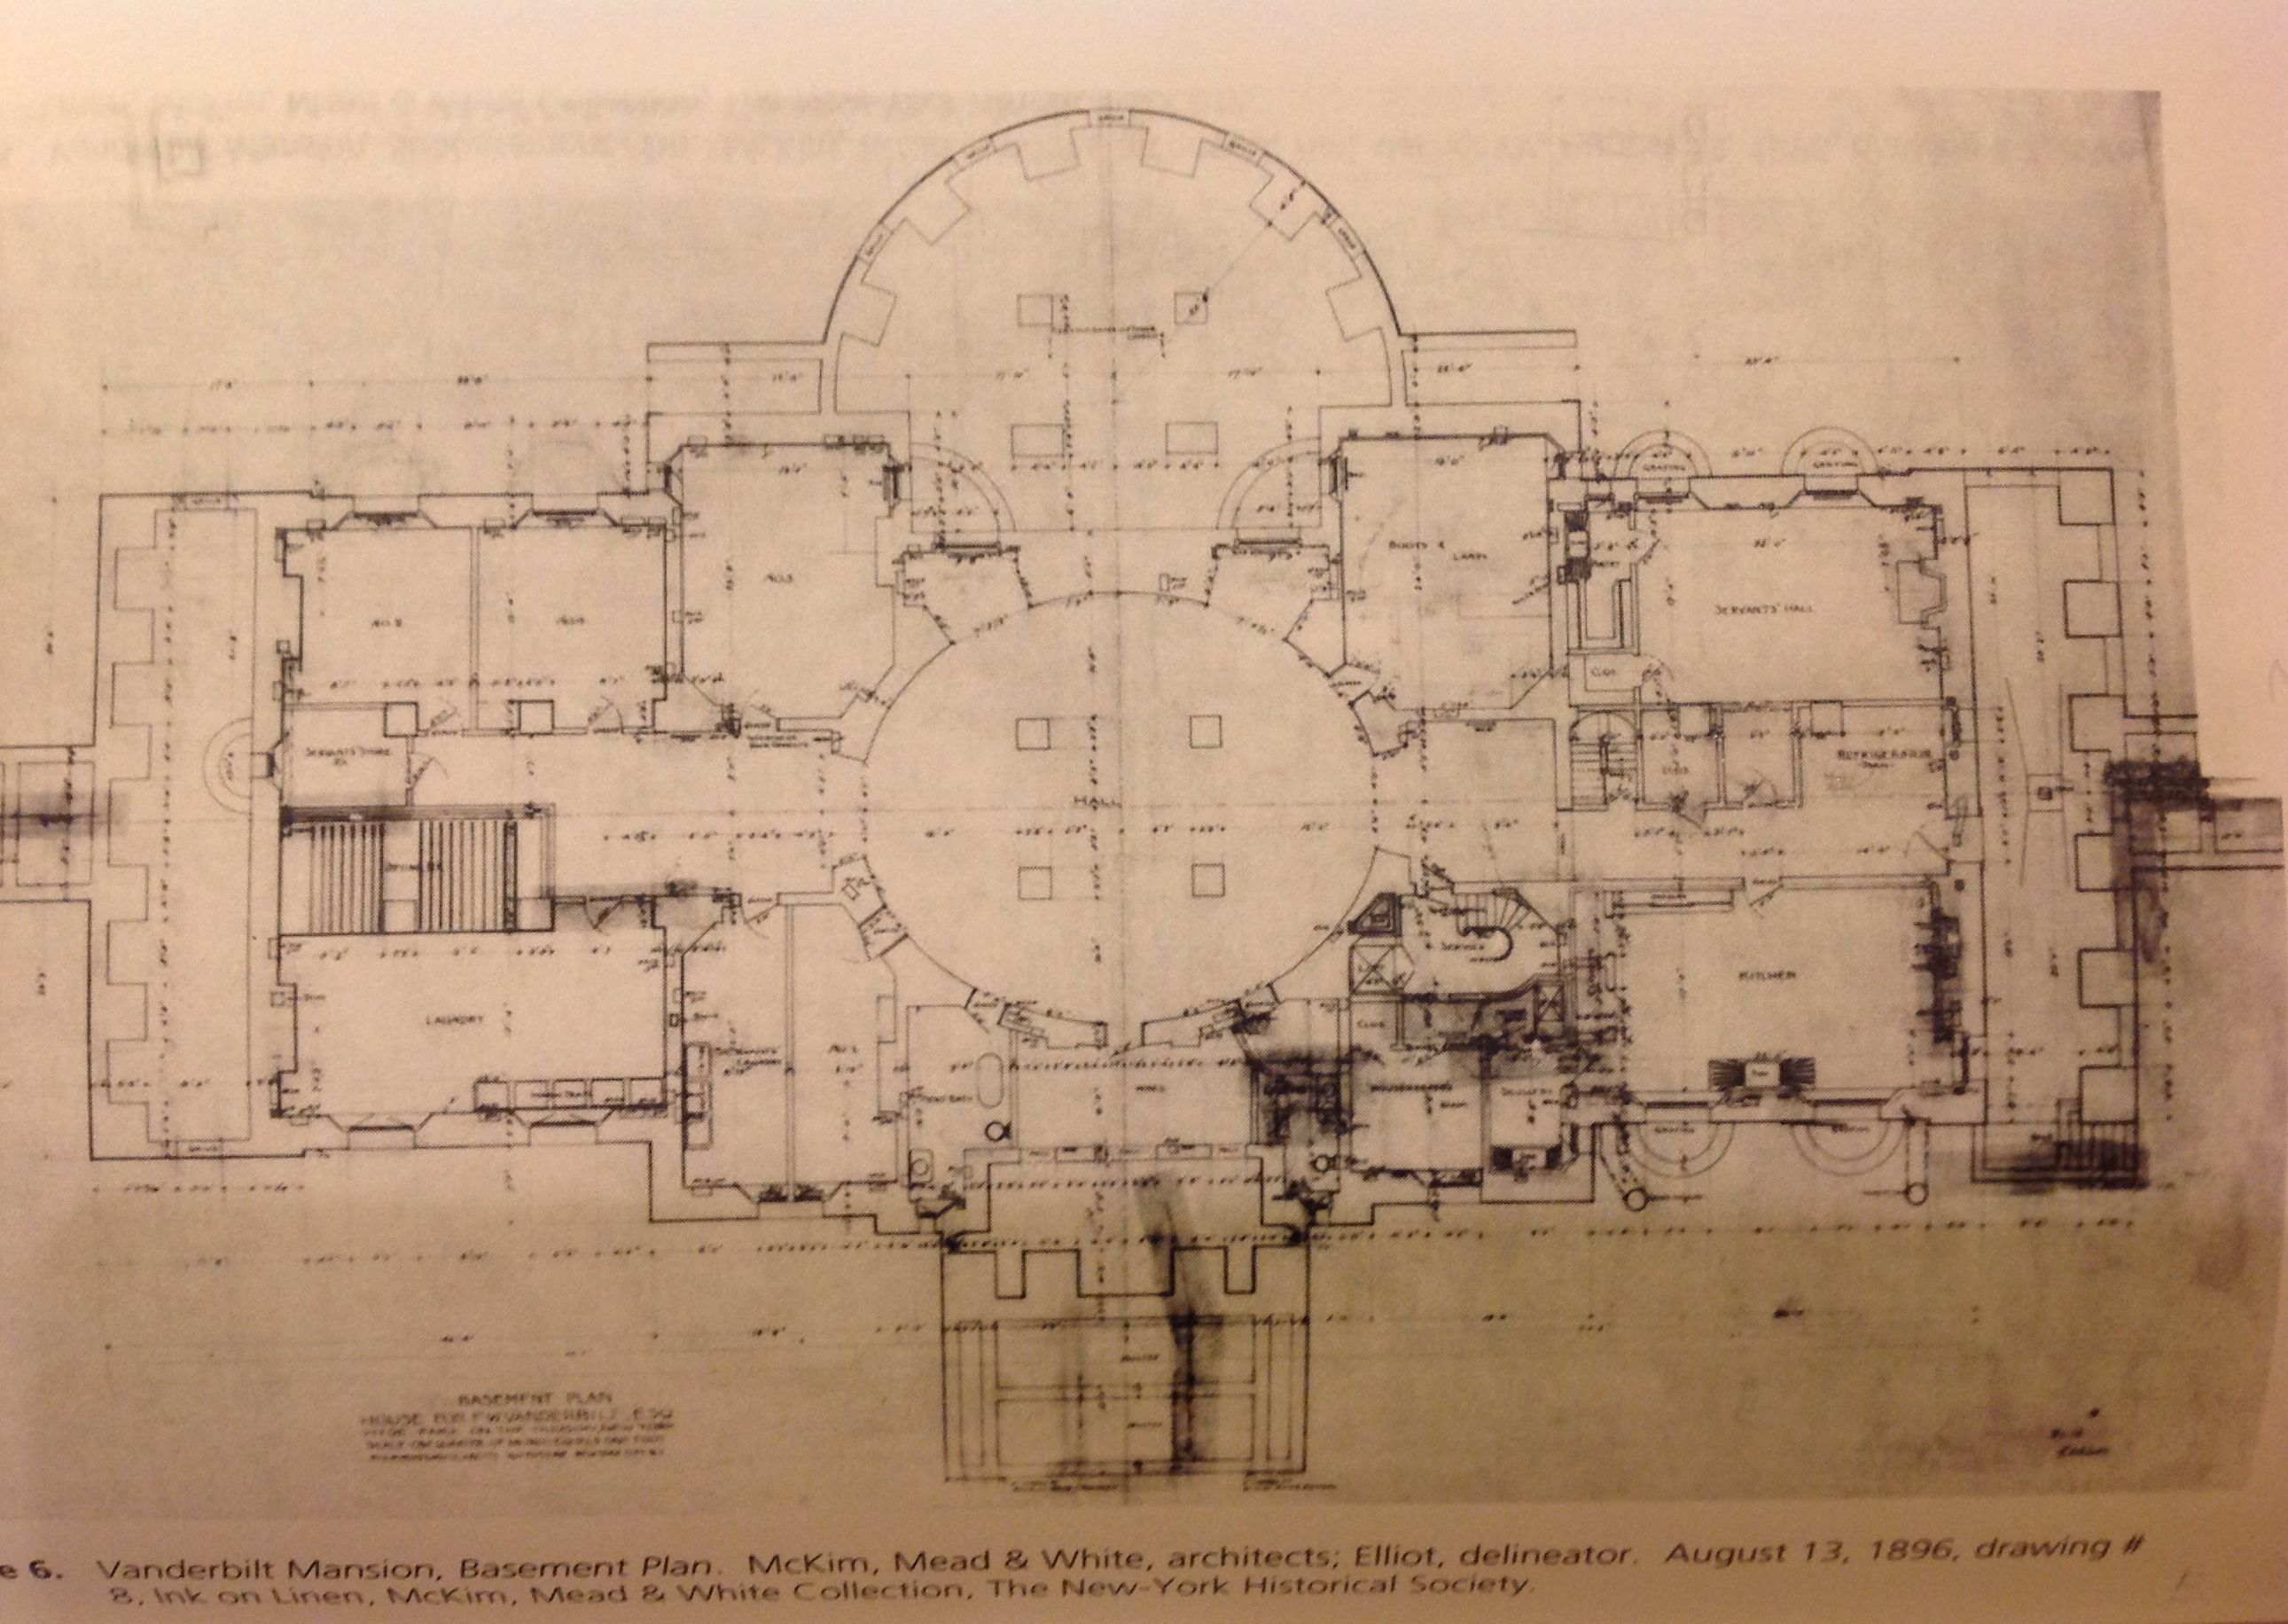 Vanderbilt Mansion Hyde Park Basement Architectural Floor Plans Mansion Plans Vanderbilt Mansions